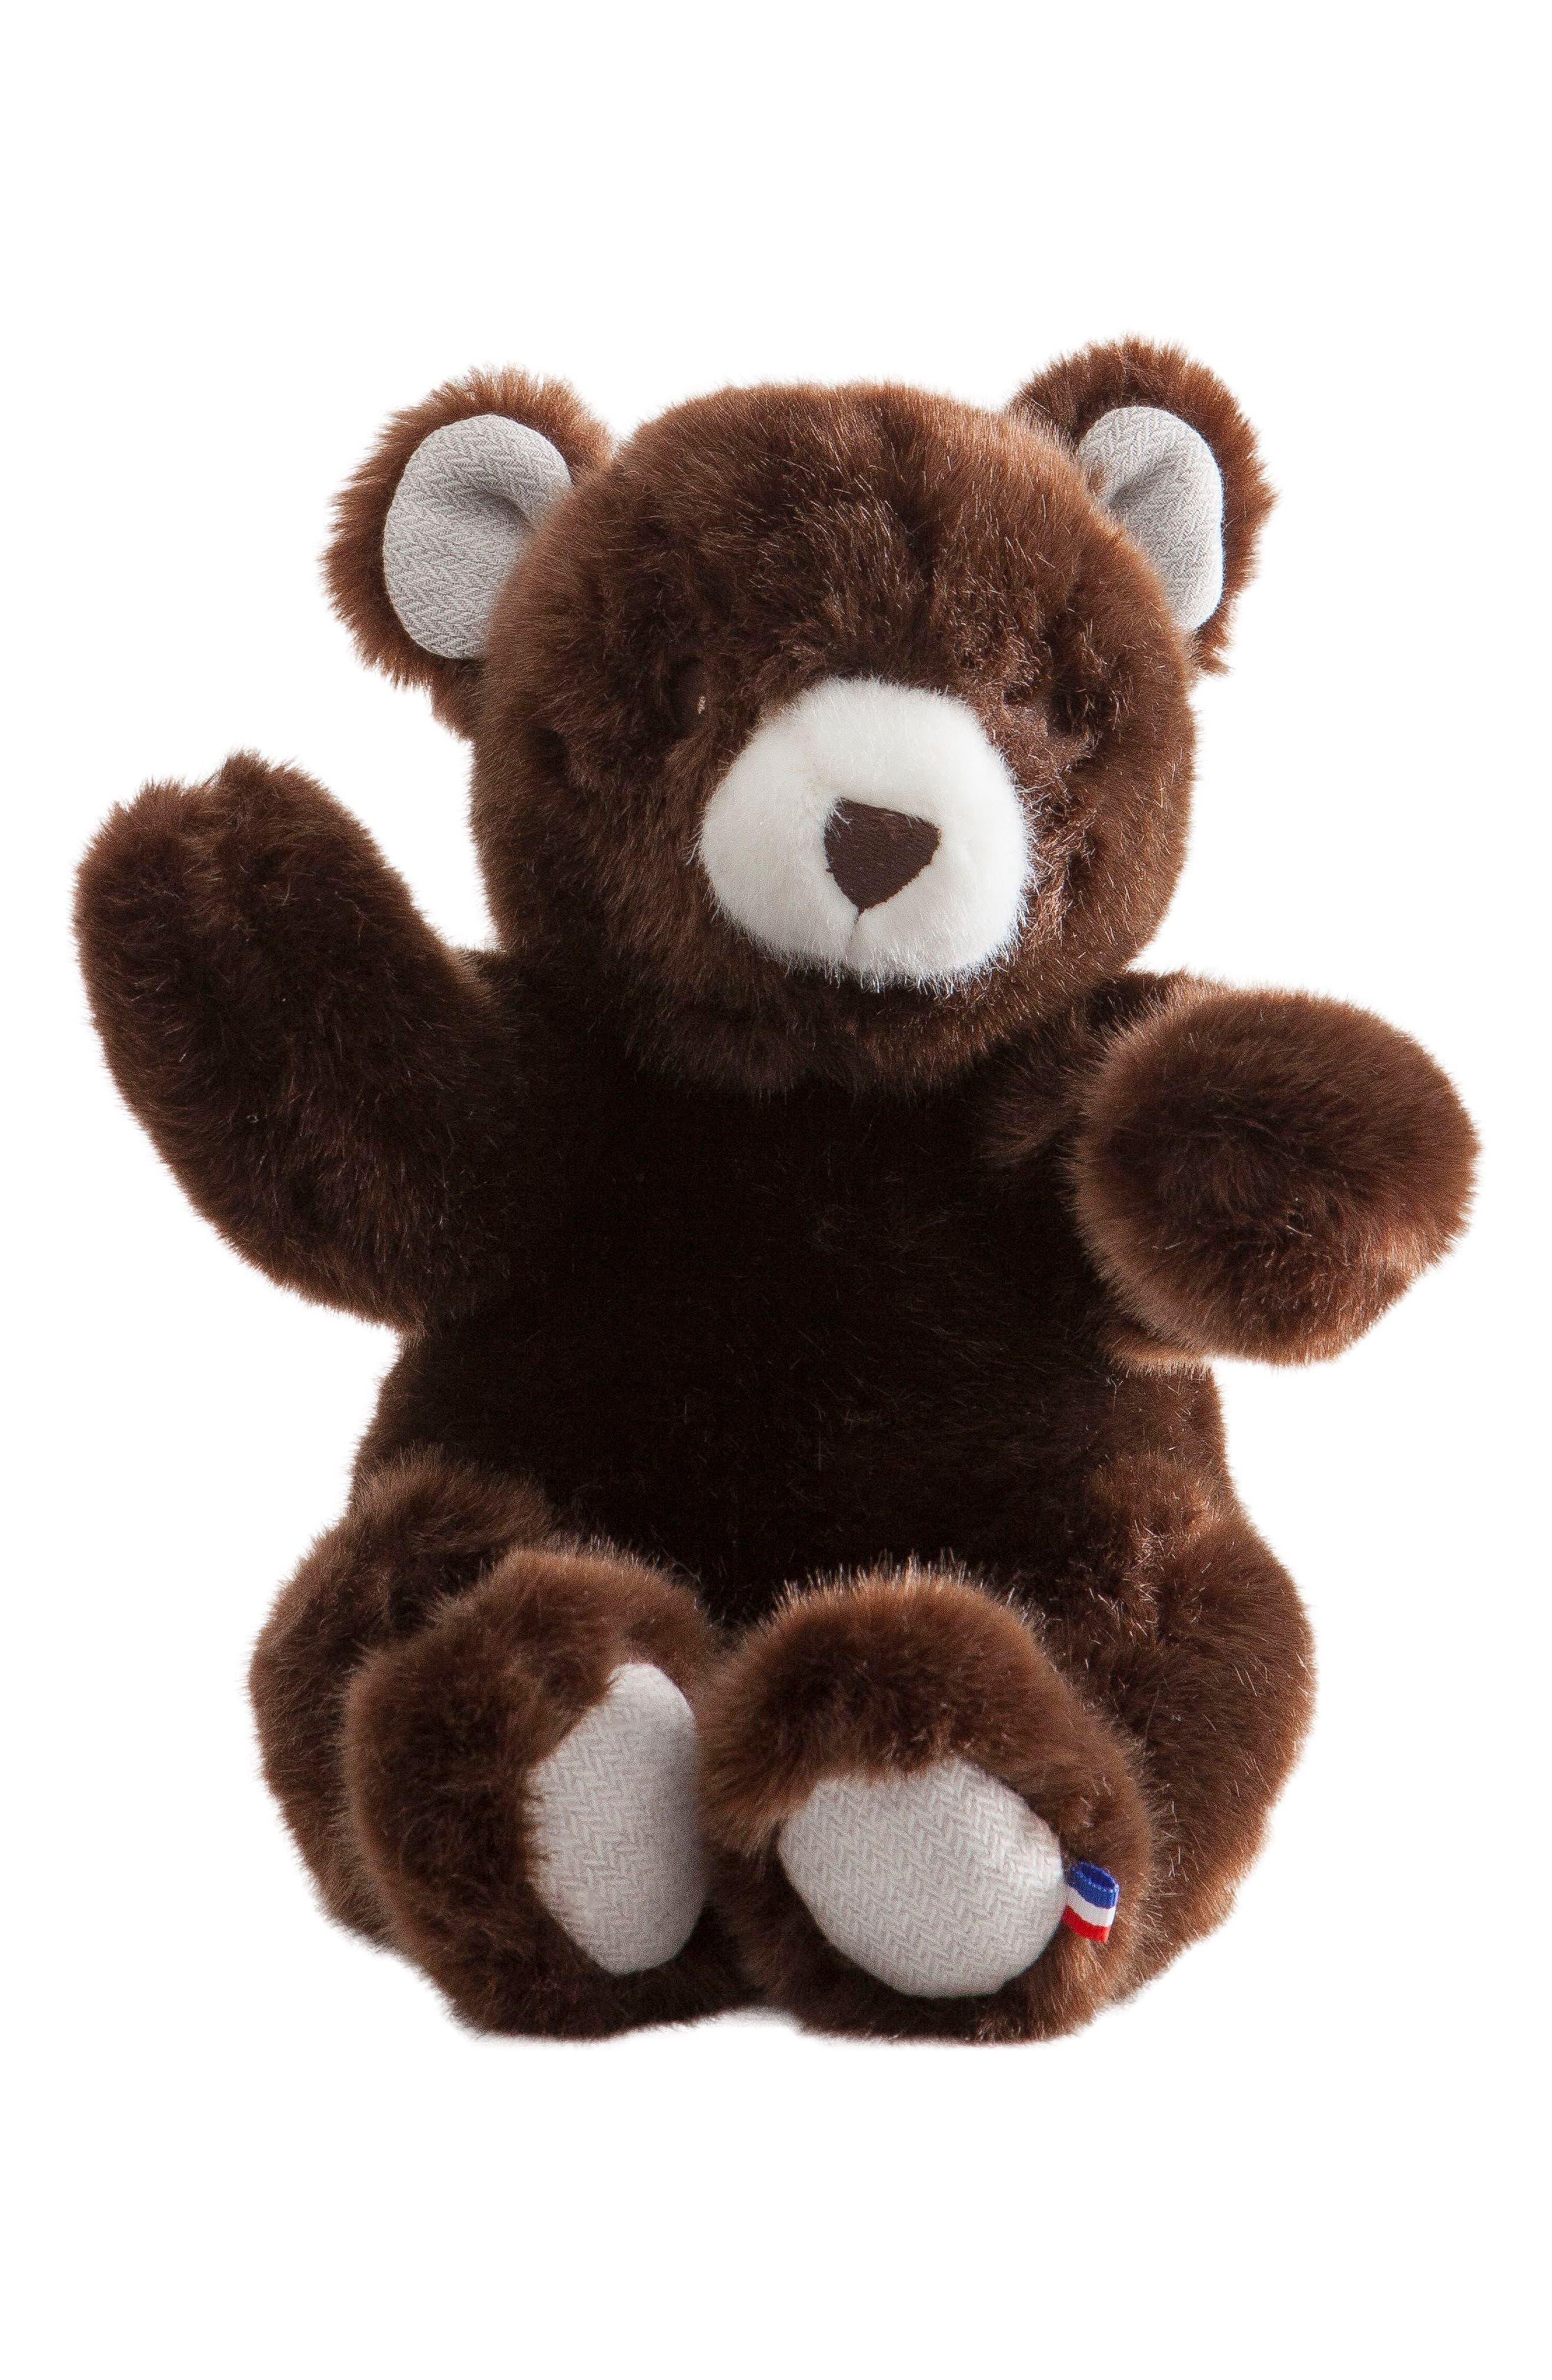 Robert the Bear Stuffed Animal,                         Main,                         color, BROWN